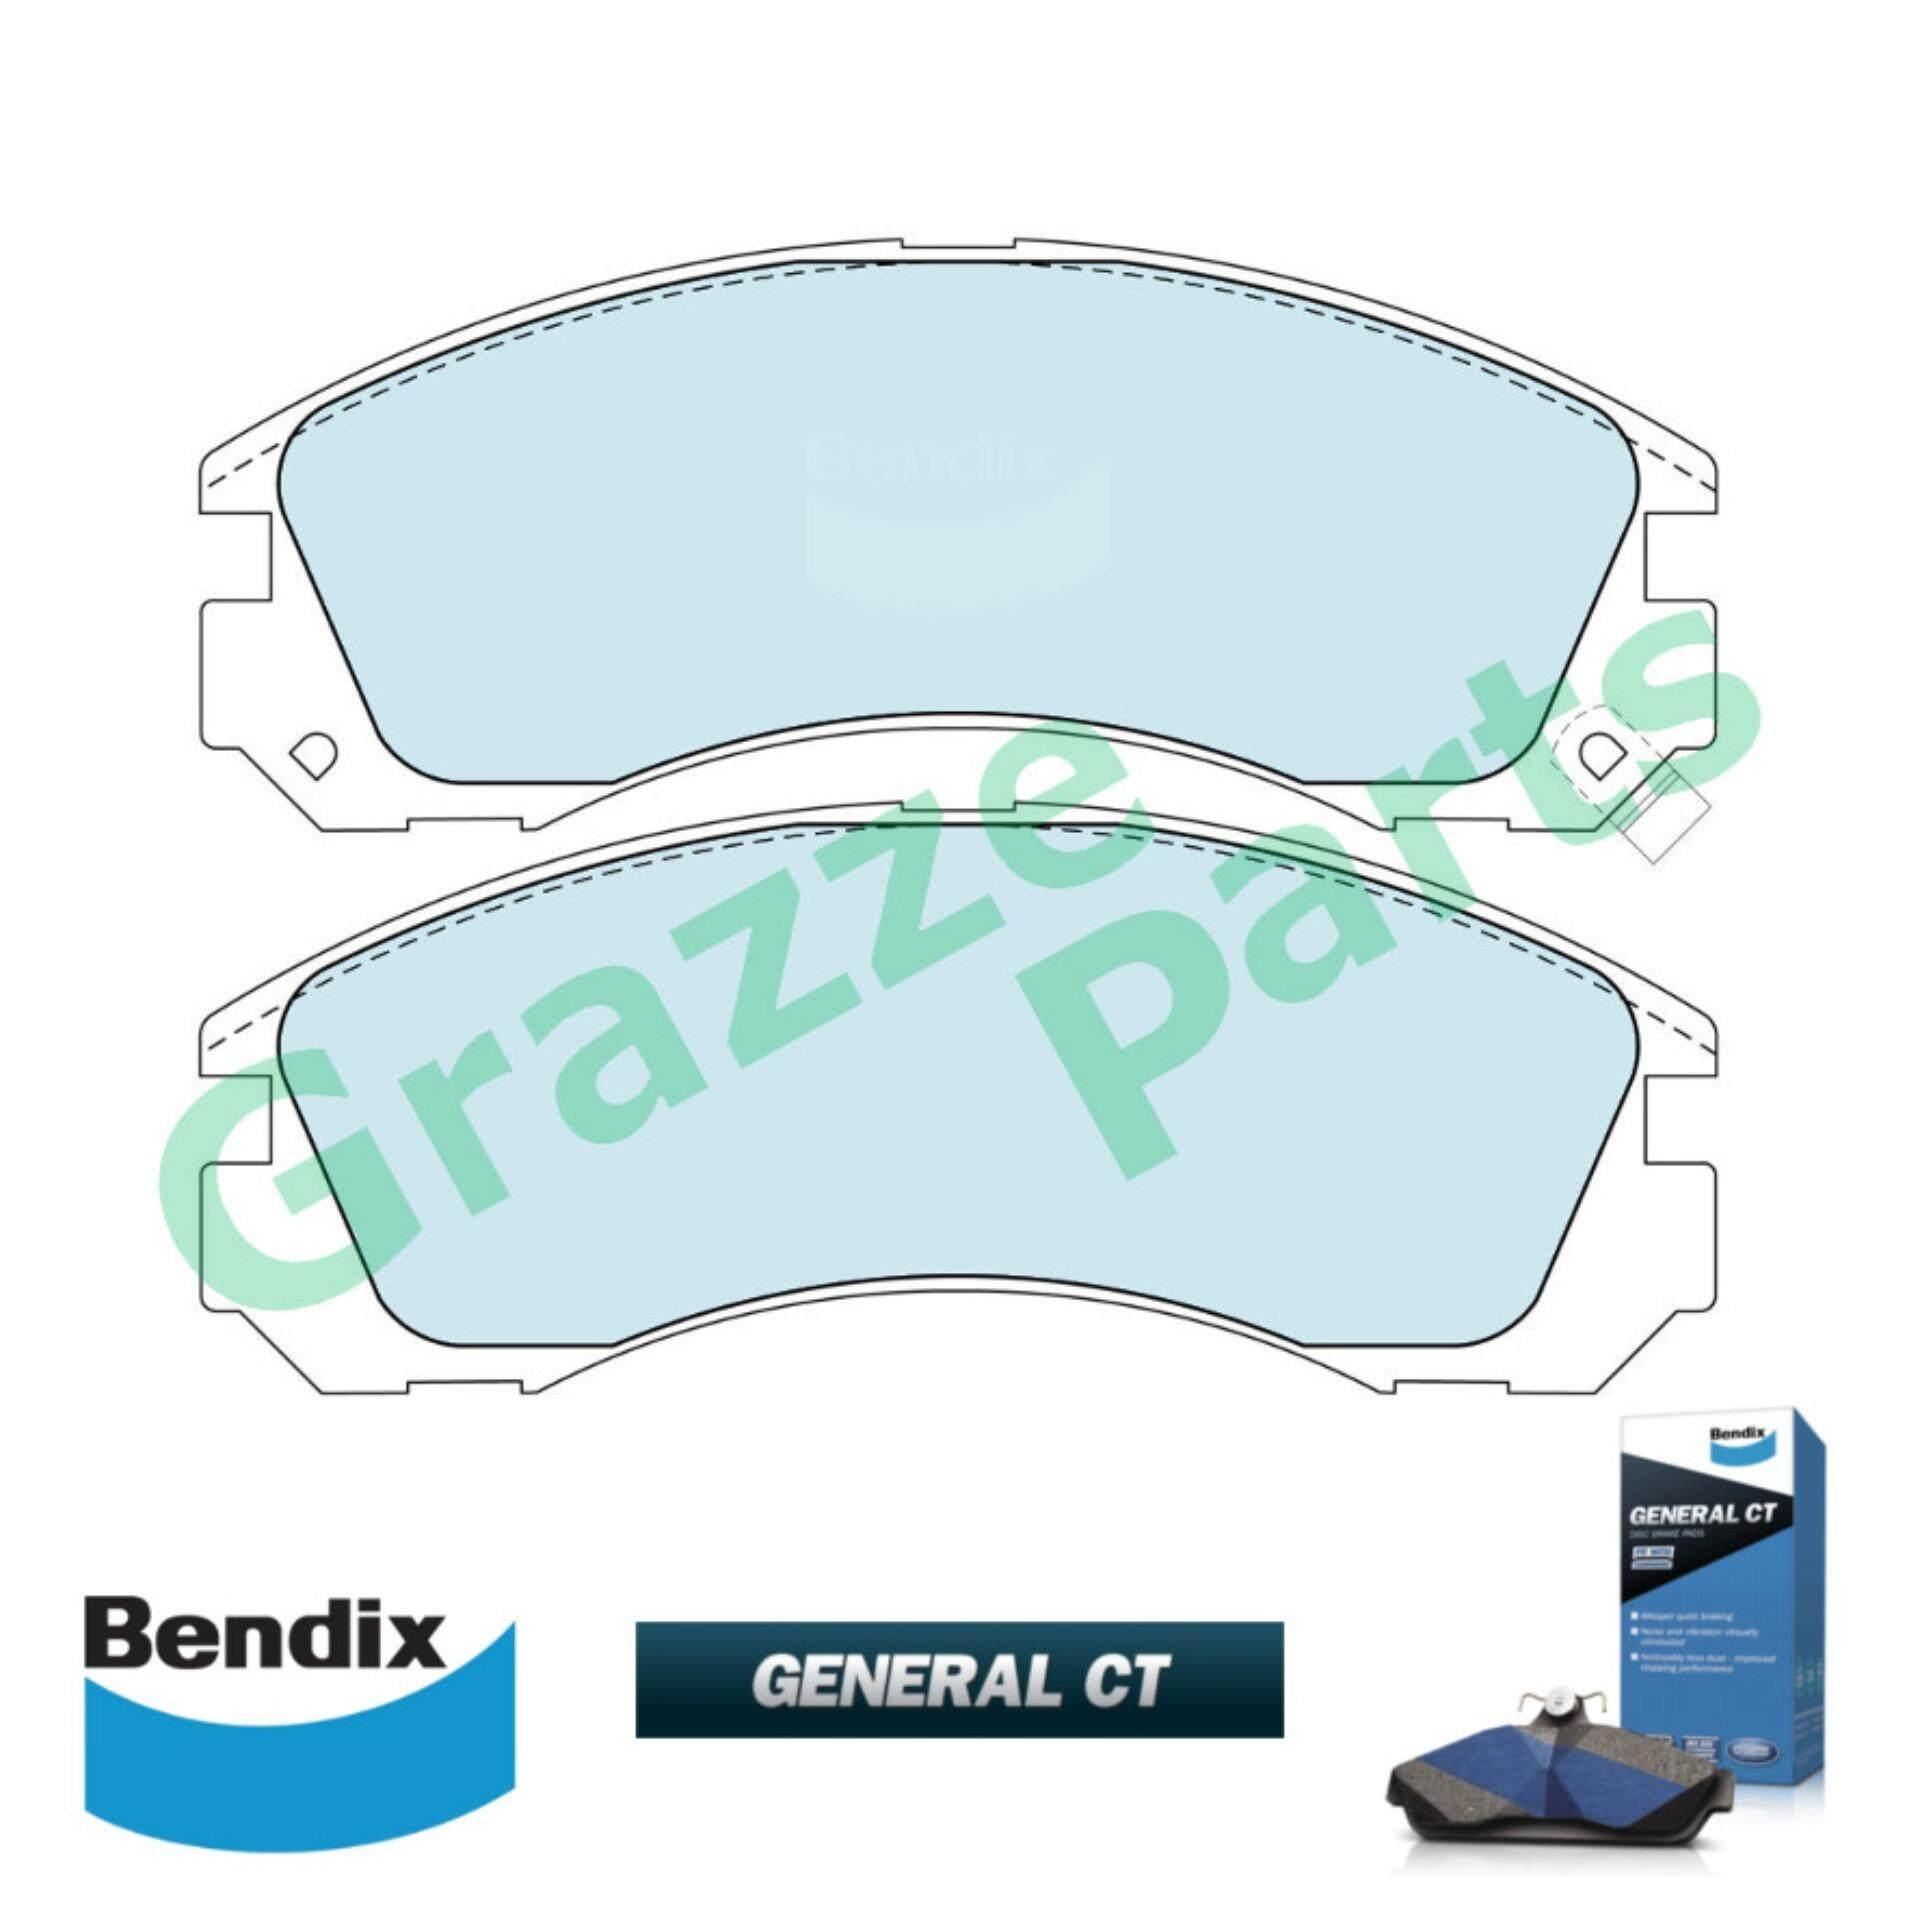 Bendix General CT Disc Brake Pad Front for DB1223 - Mitsubishi Pajero V6 V46 1991-1999 Galant 1990-1994 Airtrek Turbo